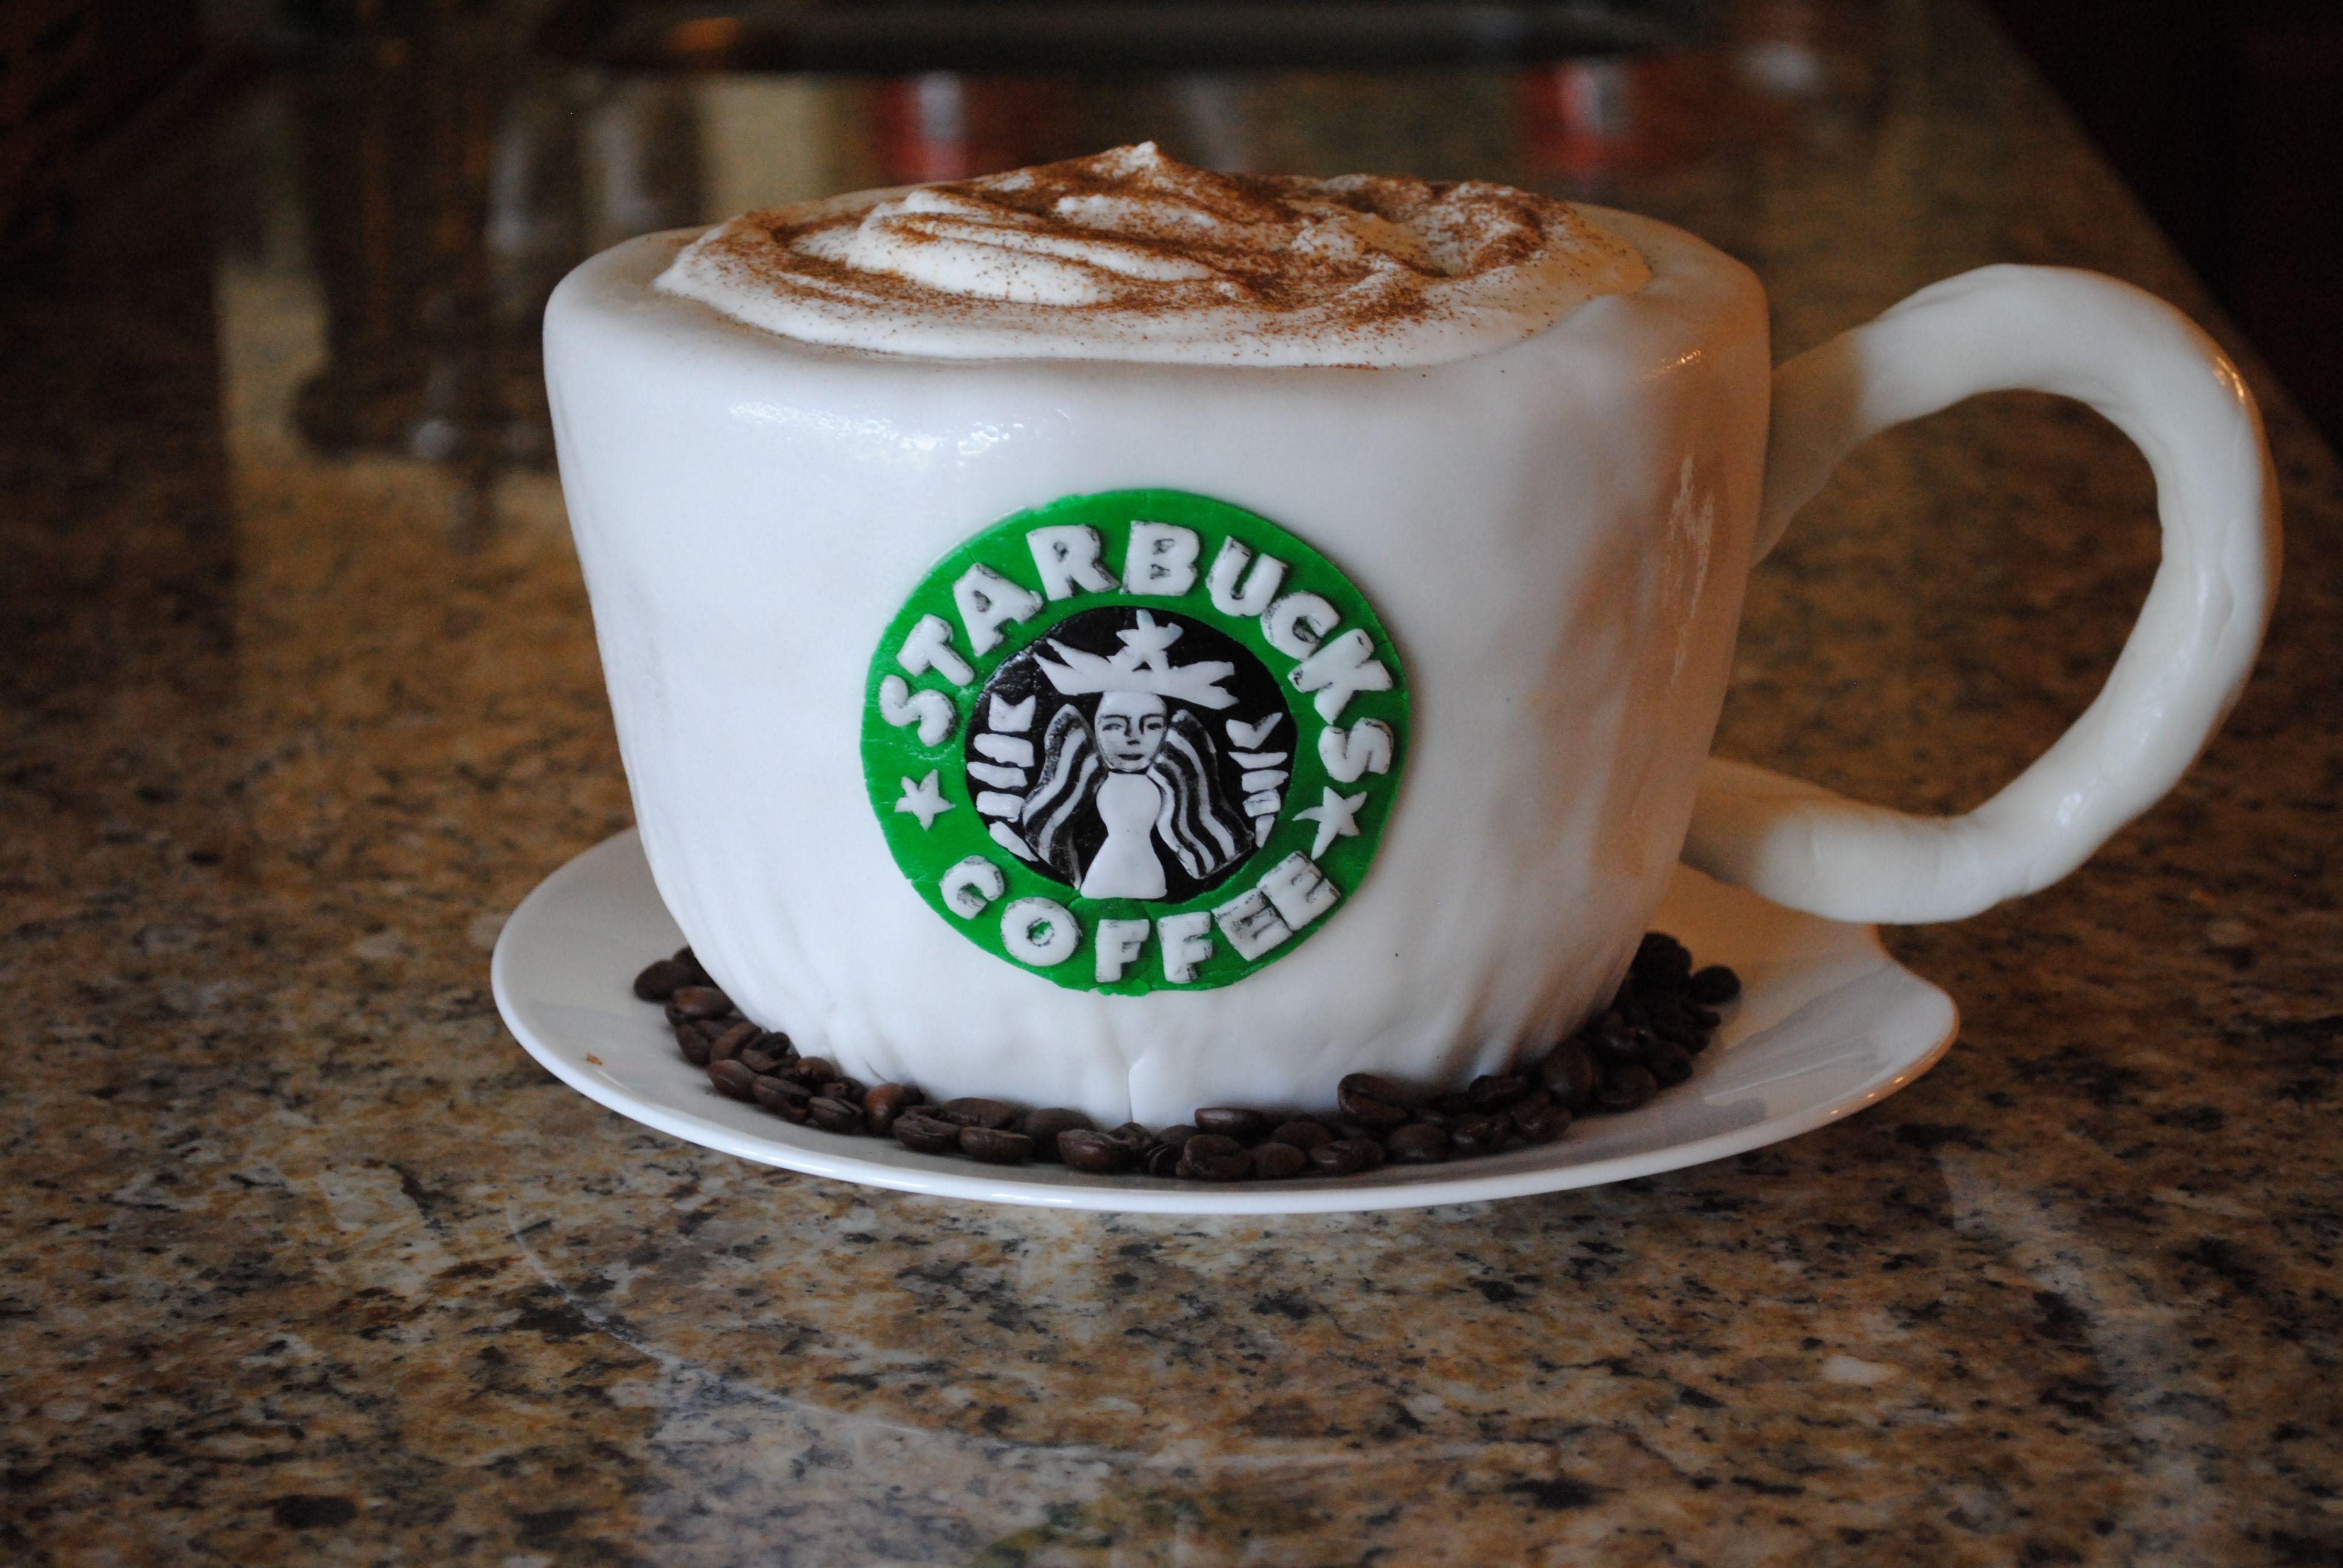 Starbucks Cake #starbuckscake Starbucks Cake #starbuckscake